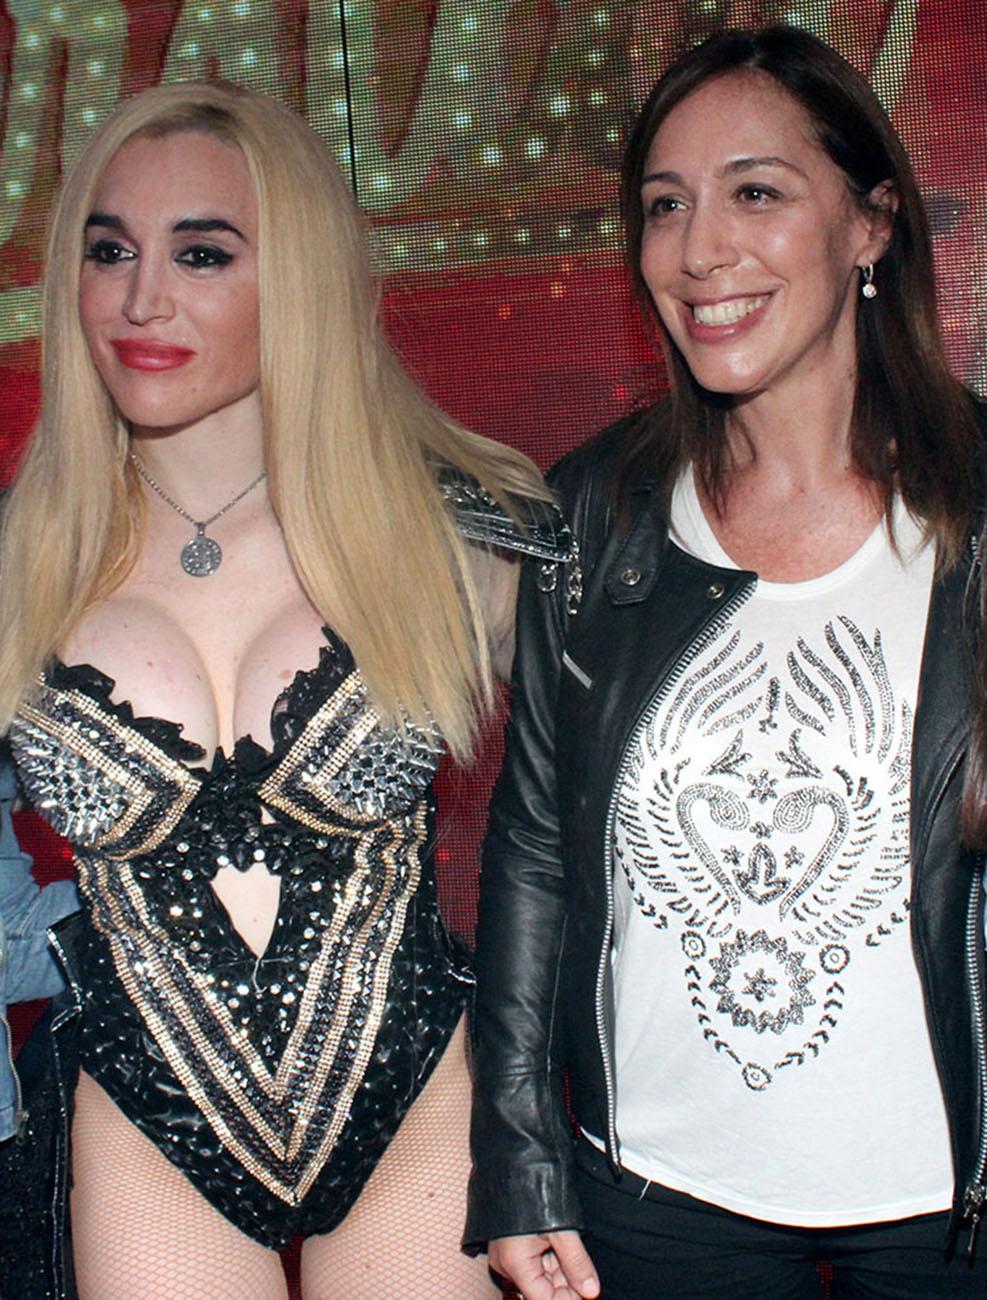 (Eduardo Aguada) Vidal fue al teatro a ver a Fatima Florez y posó para los fotógrafos.